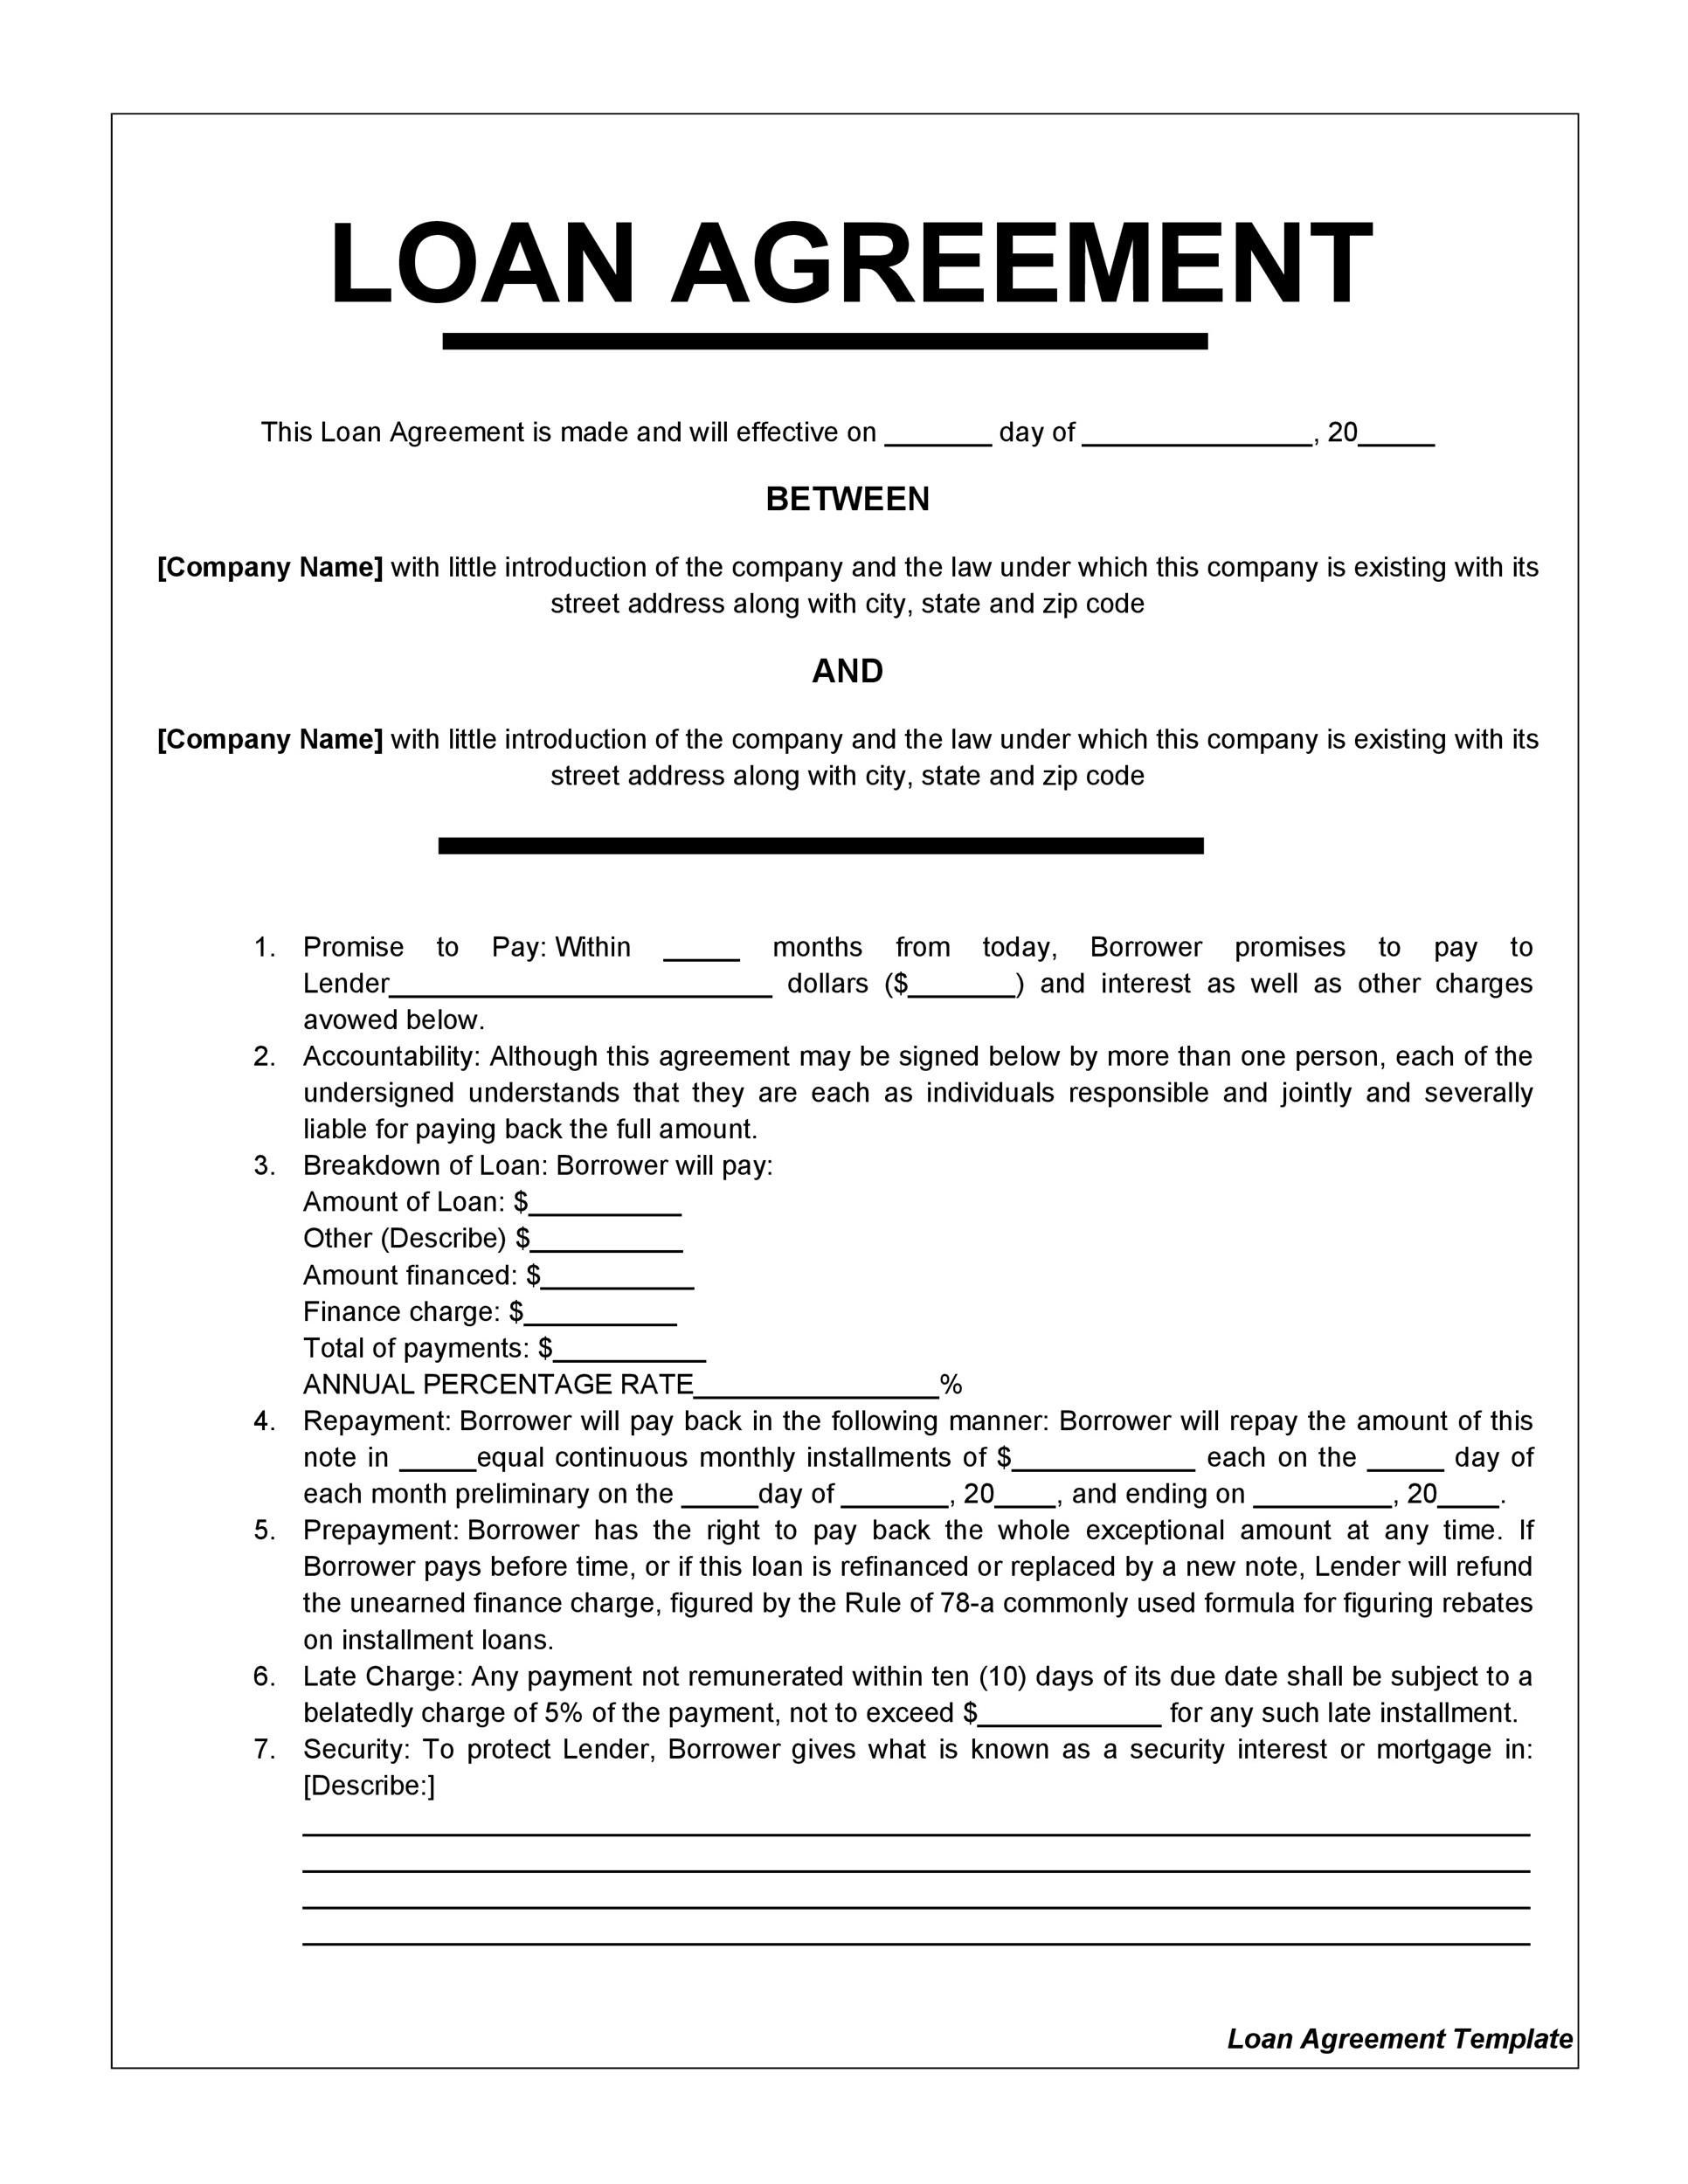 Financial Loan Template 2 Things You Should Do In Financial Loan Template In 2020 Contract Template Personal Loans Small Business Loans